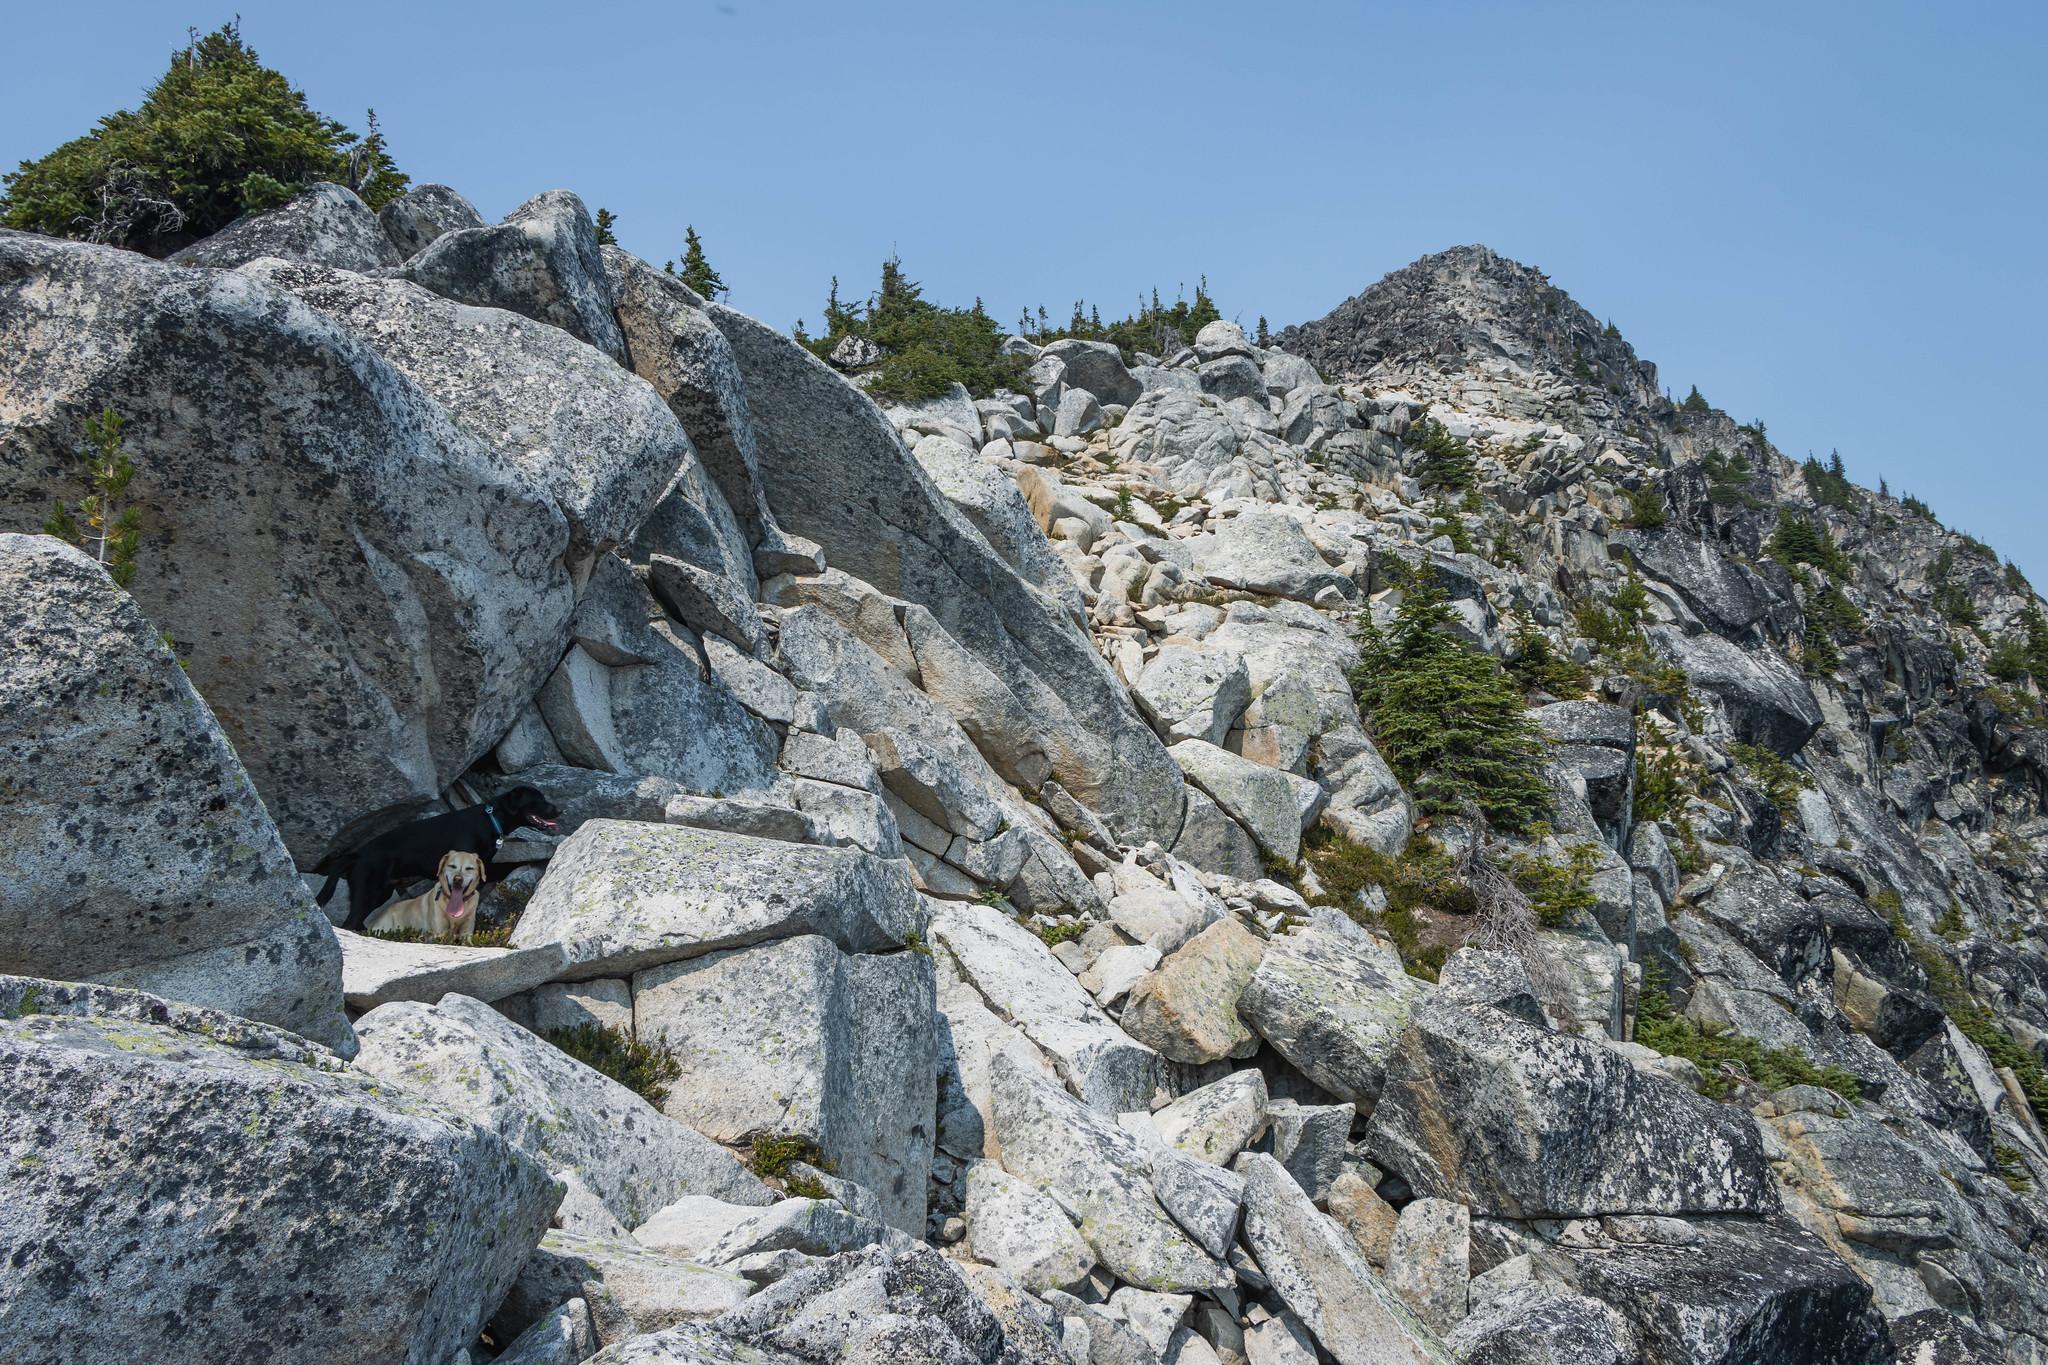 The final stretch on Pasayten Peak